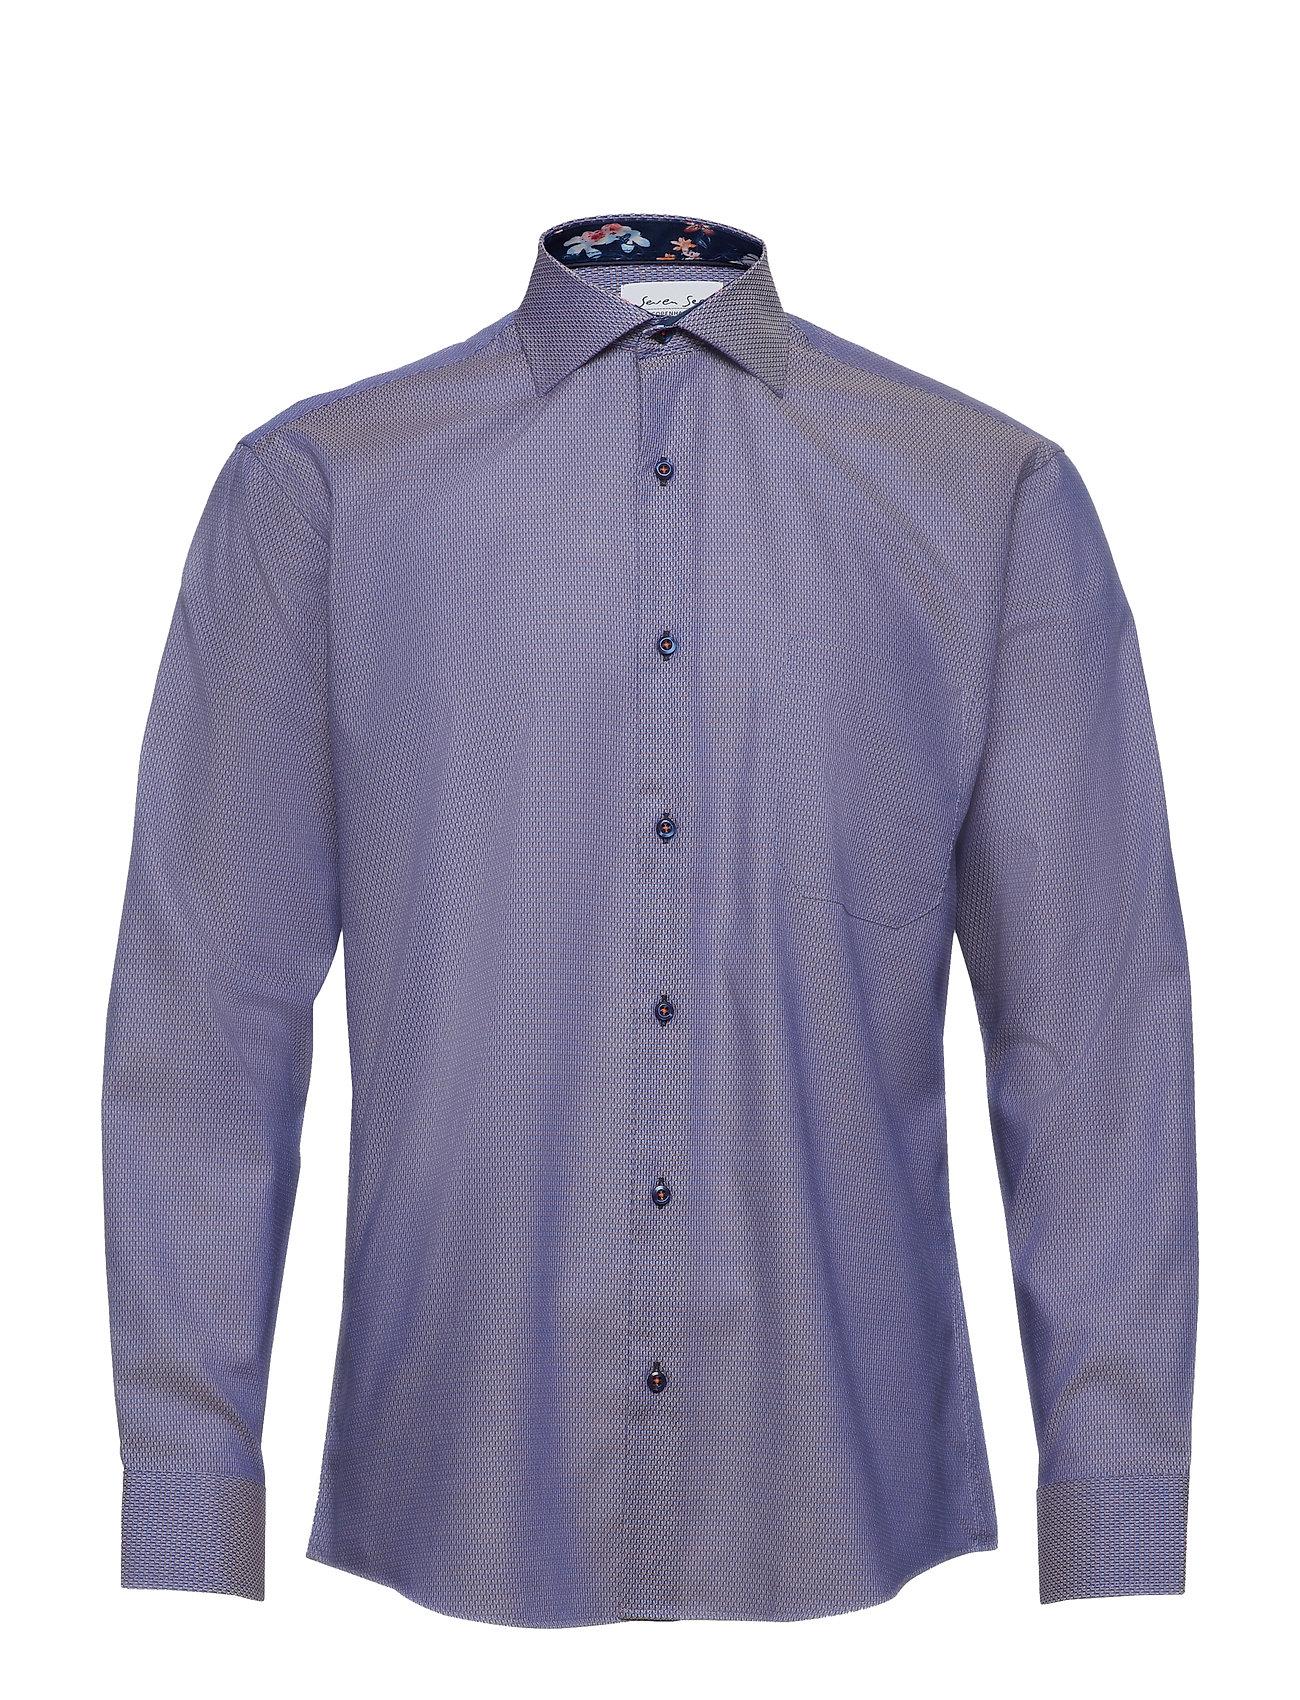 bd7c628e Seven Seas casual skjorter – Fiji til herre i Lilla - Pashion.dk